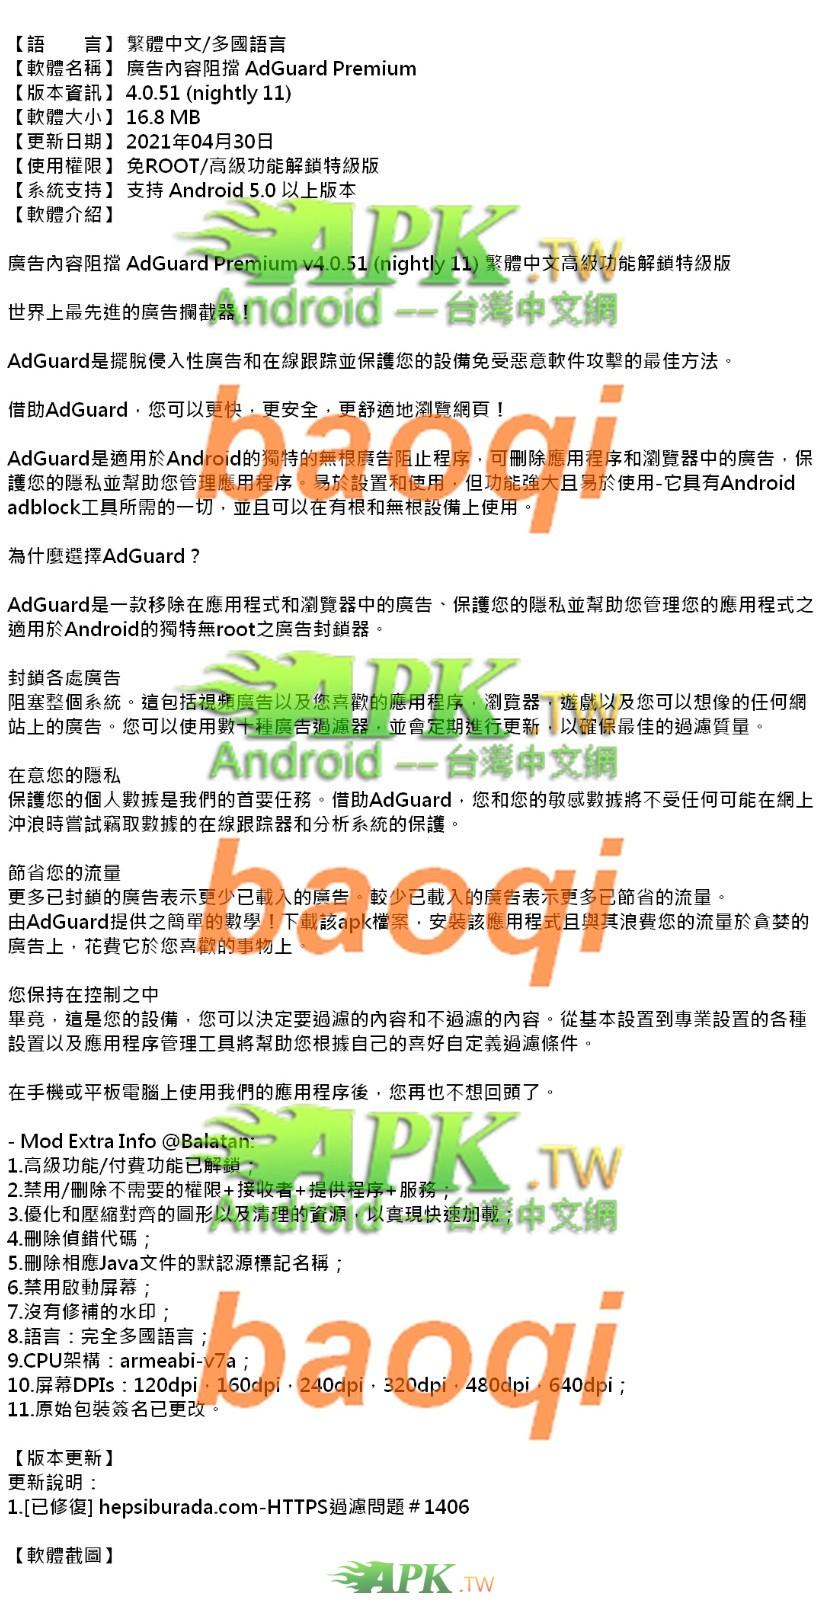 AdGuard_Premium_4.0.51_nightly11_.jpg